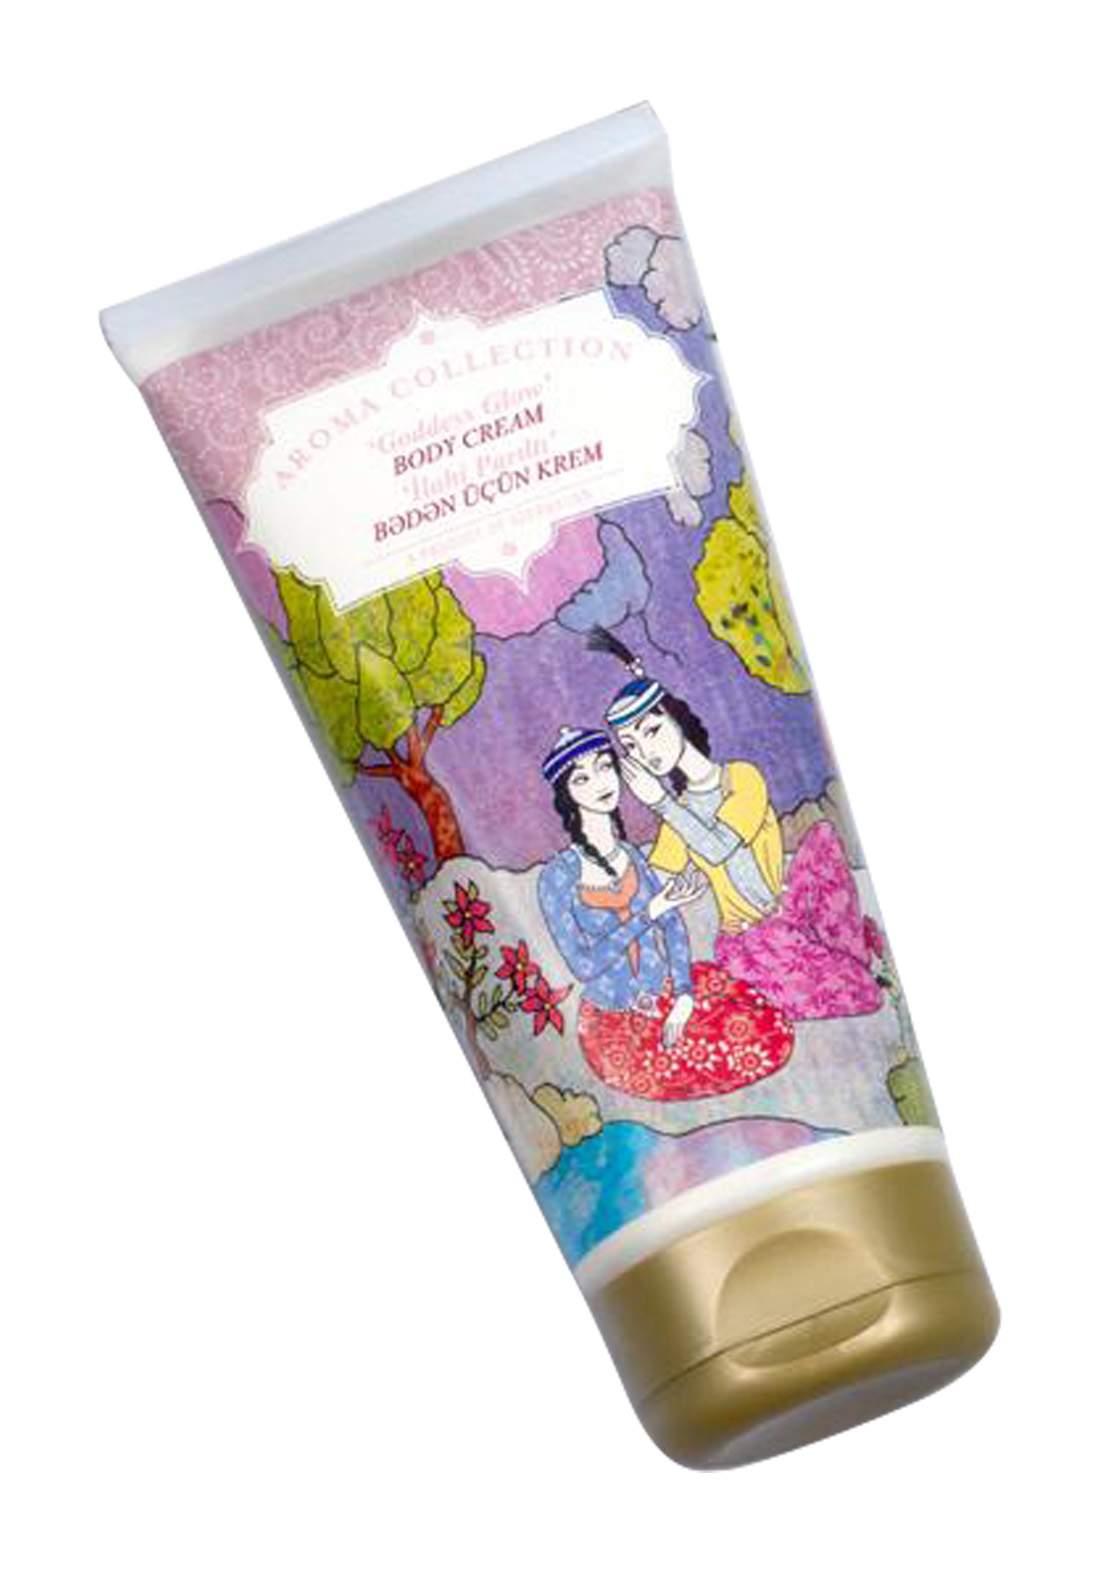 Aroma Collection Goddess Glow Body Cream كريم للجسم